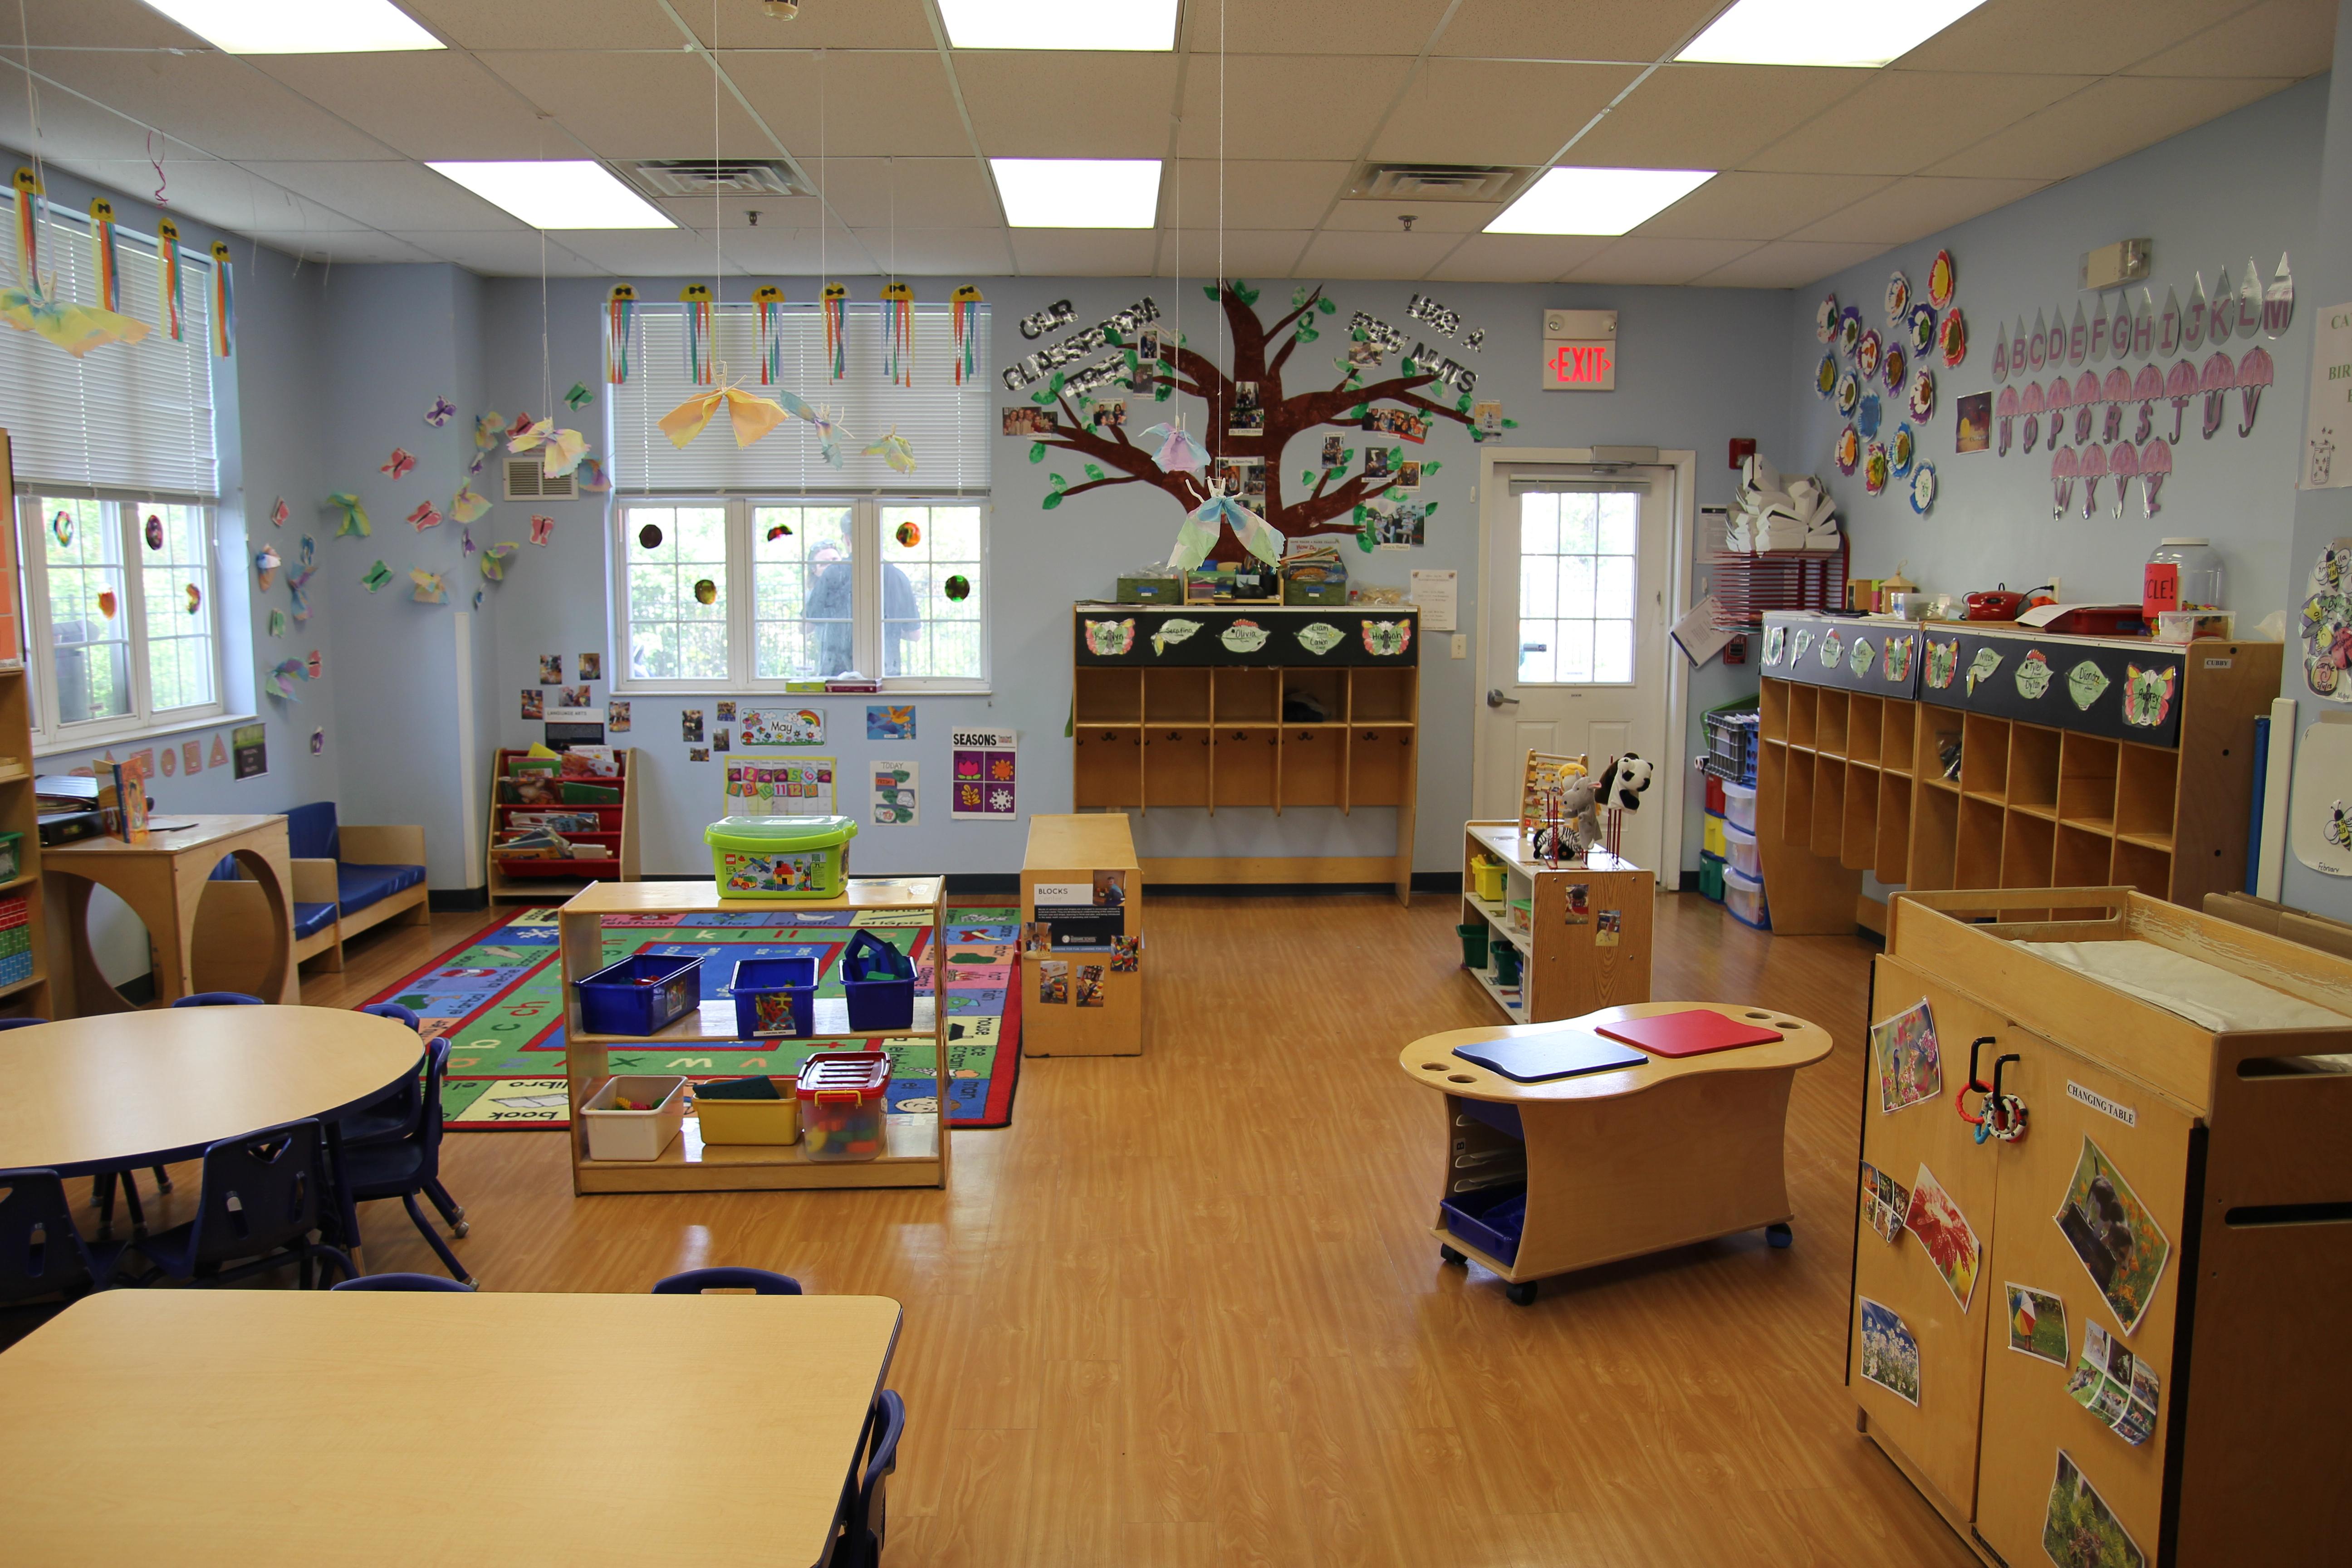 Goddard School Of Randolph Shows Off Impressive Facilities And Programs